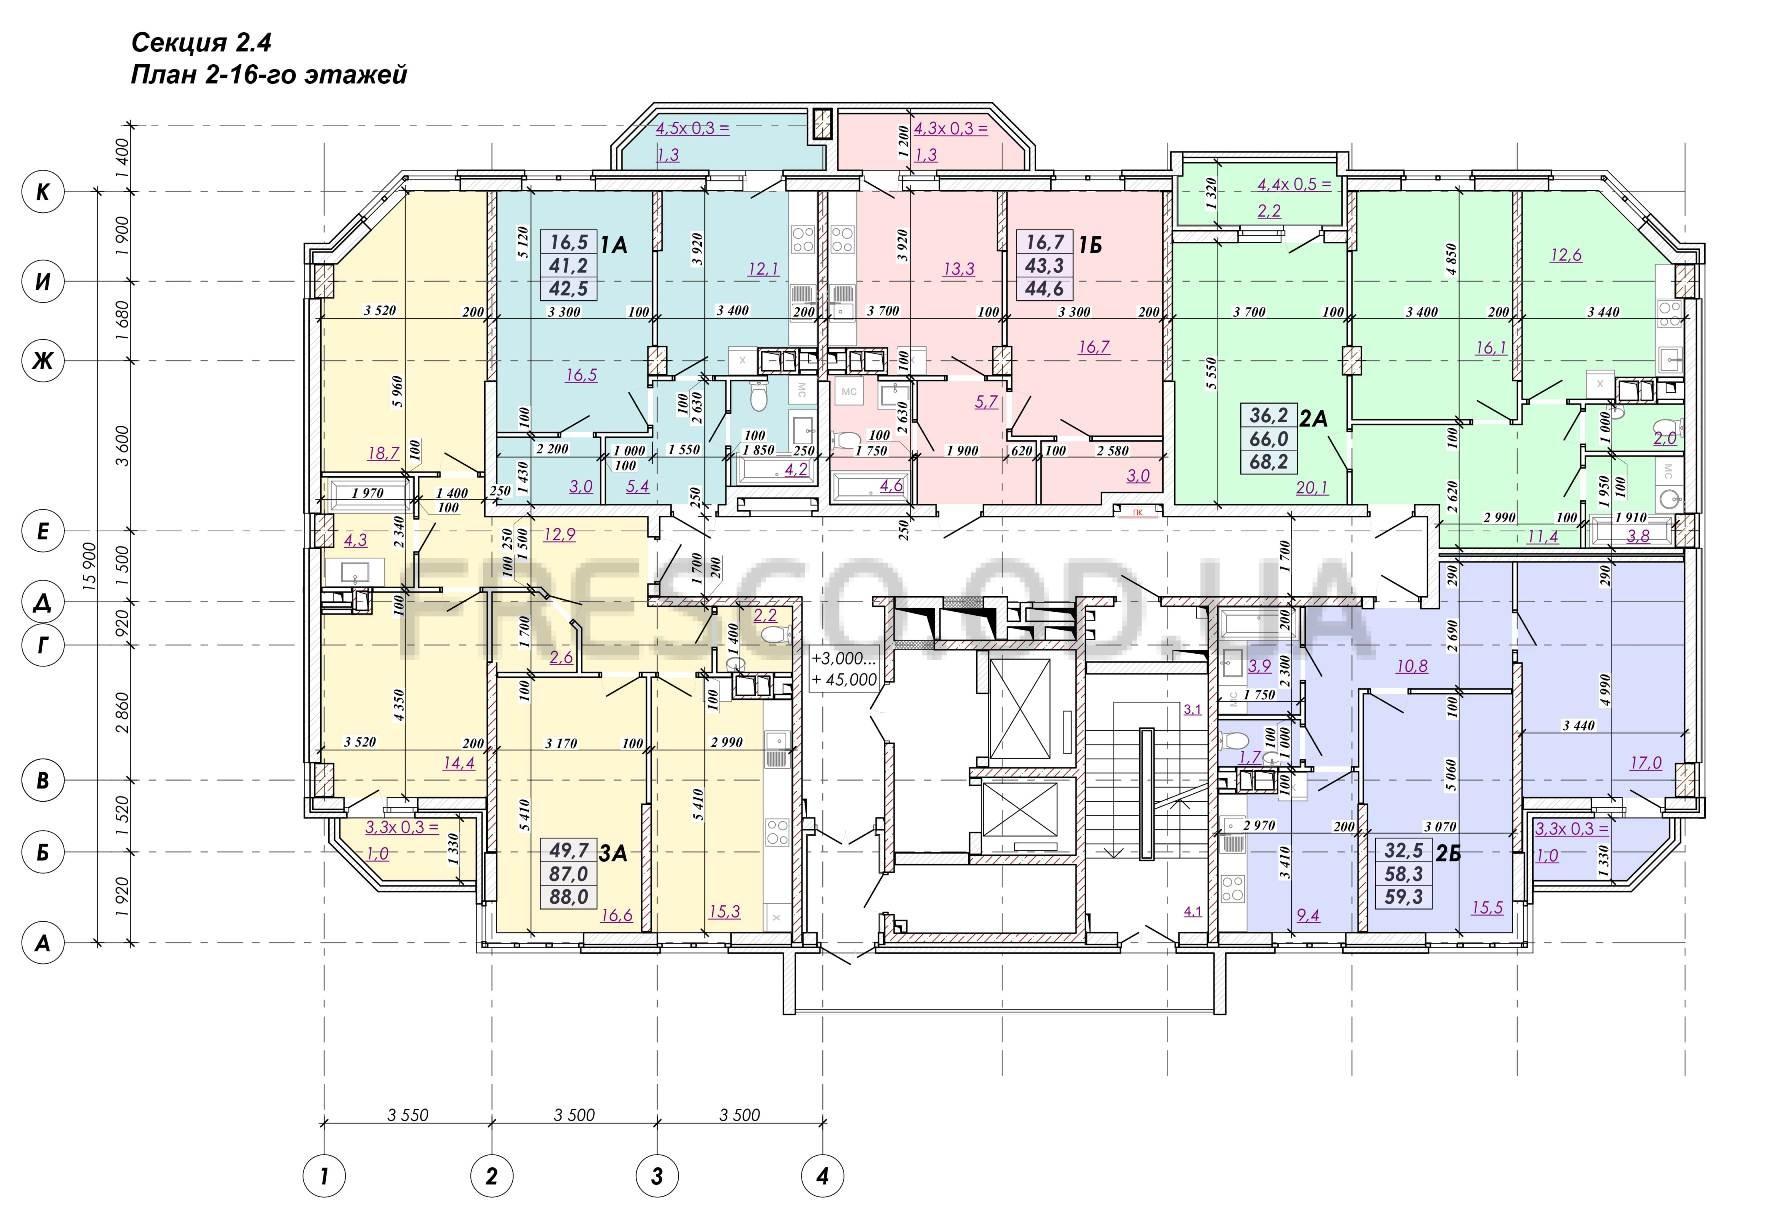 ЖК RealPark (Реал Парк) секция 2.4 план 2-16 этажа